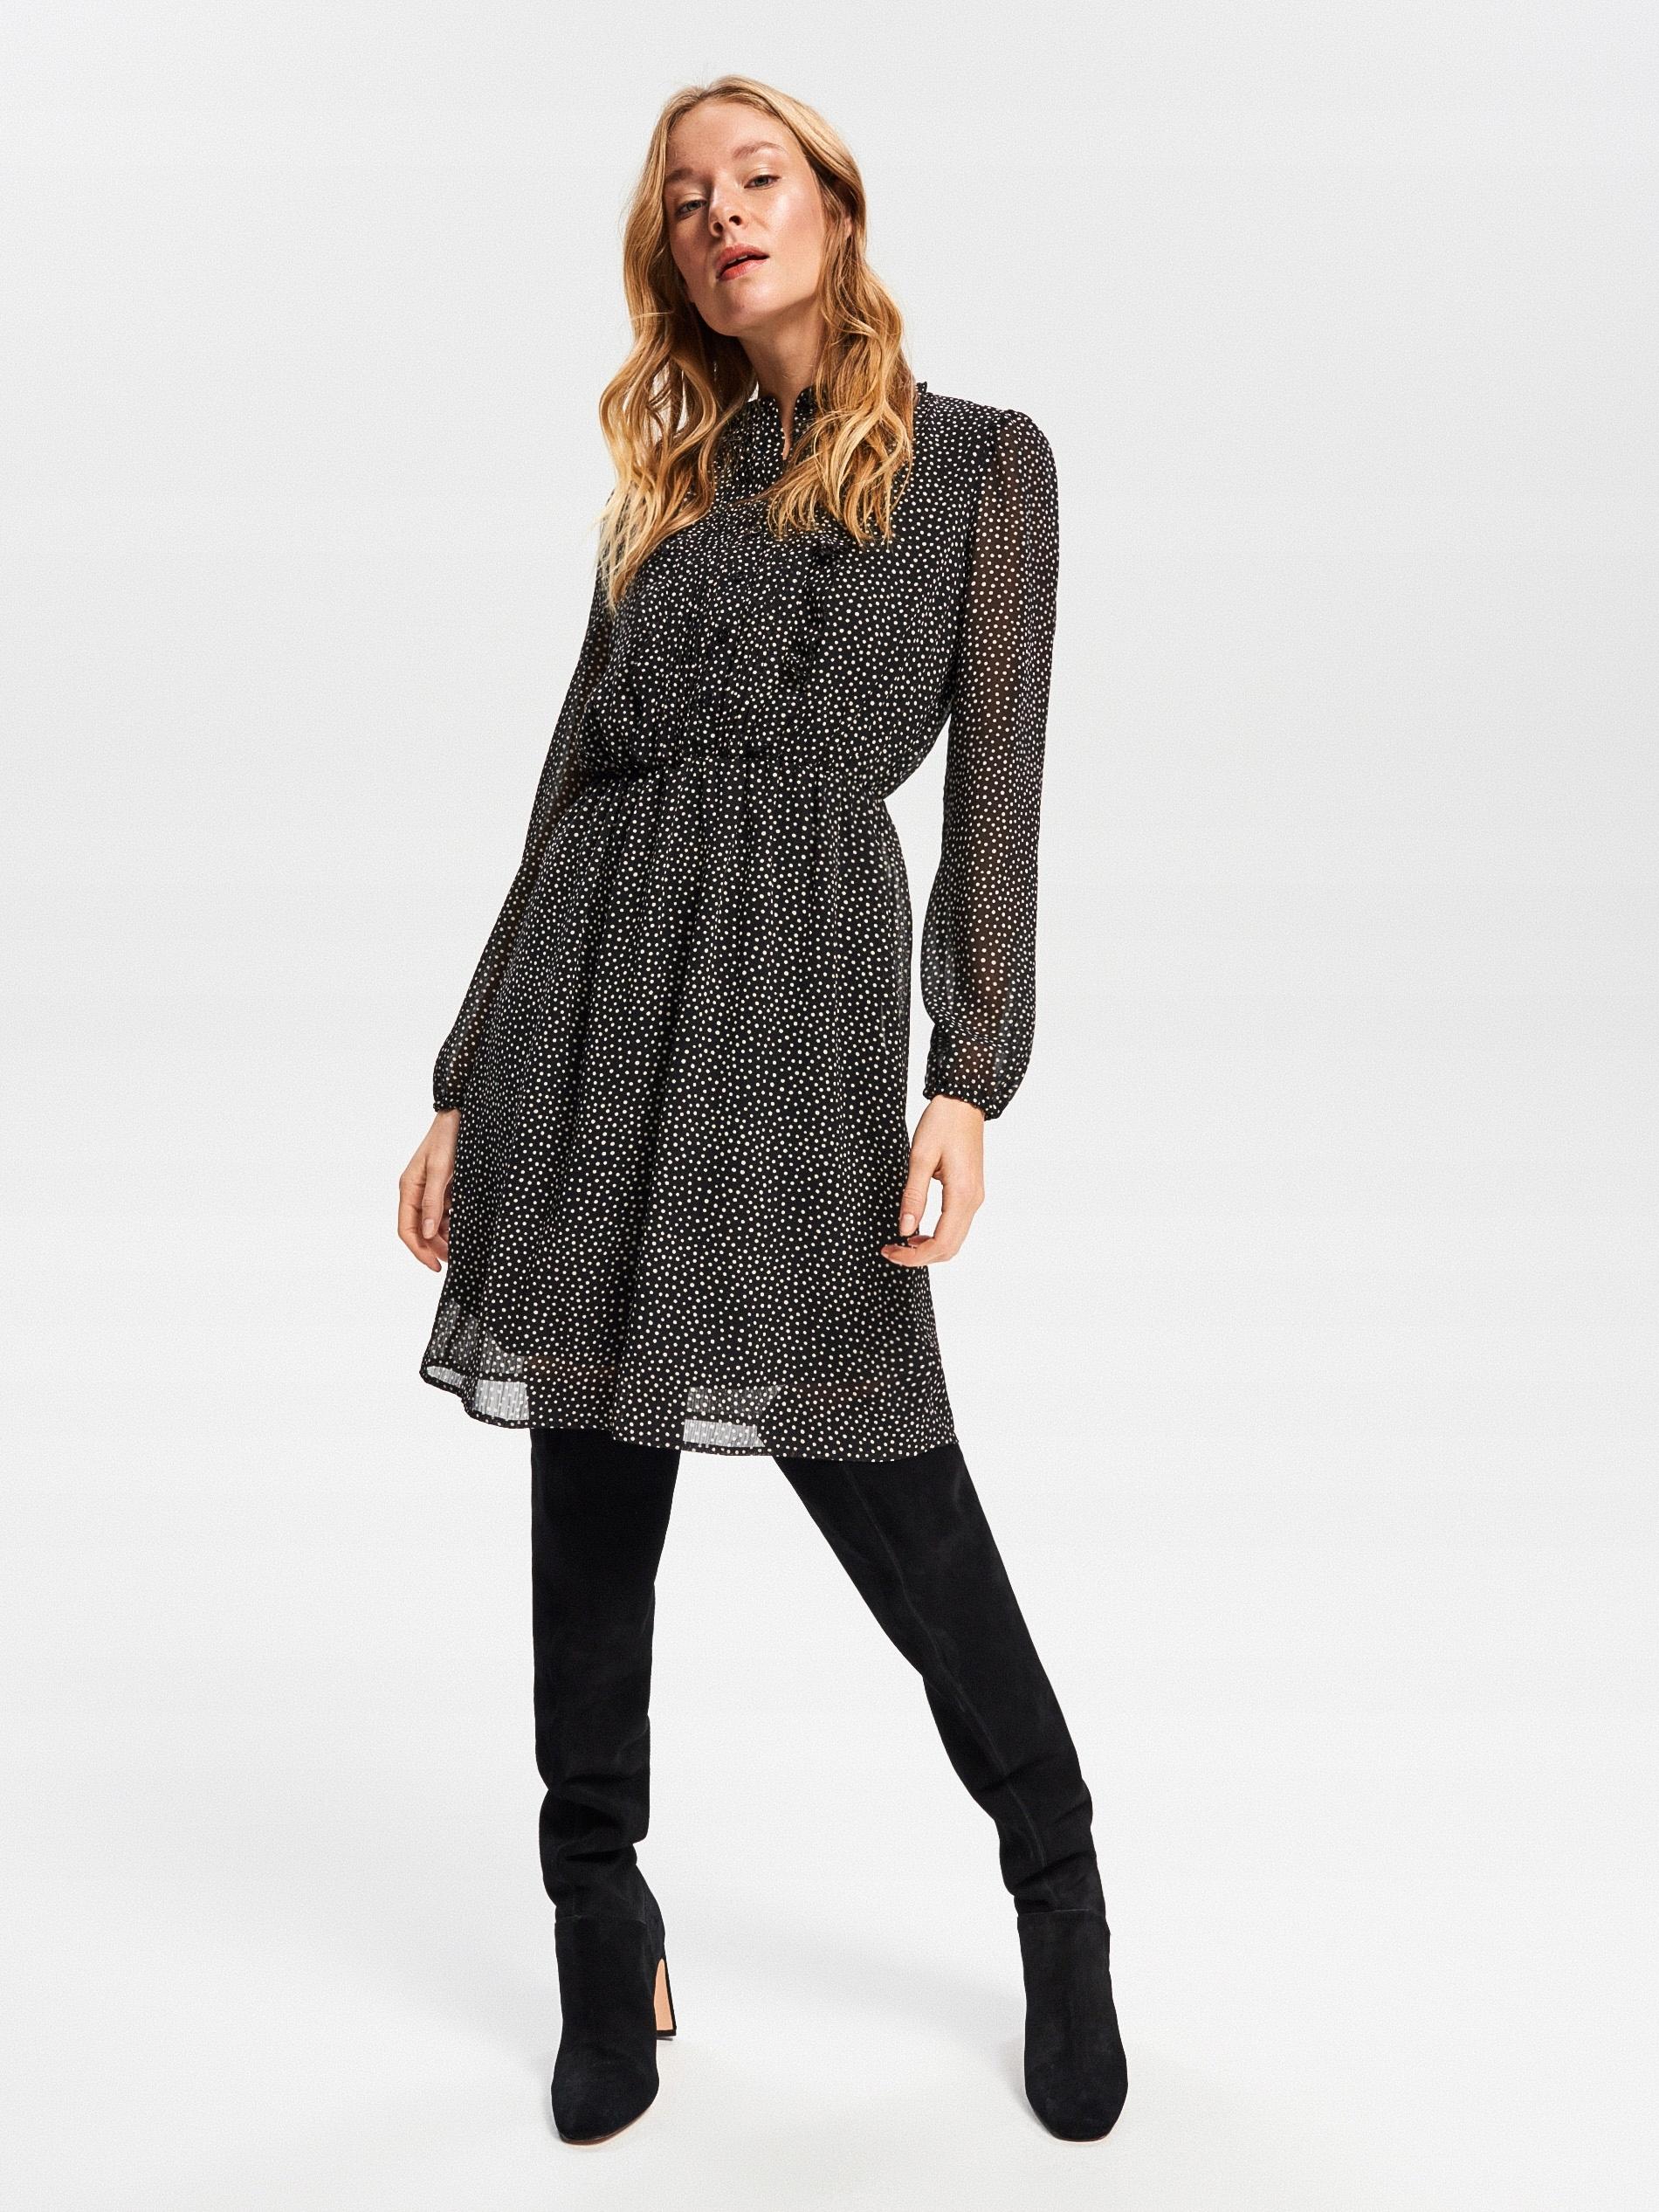 Sukienka w kropki Reserved 36 S